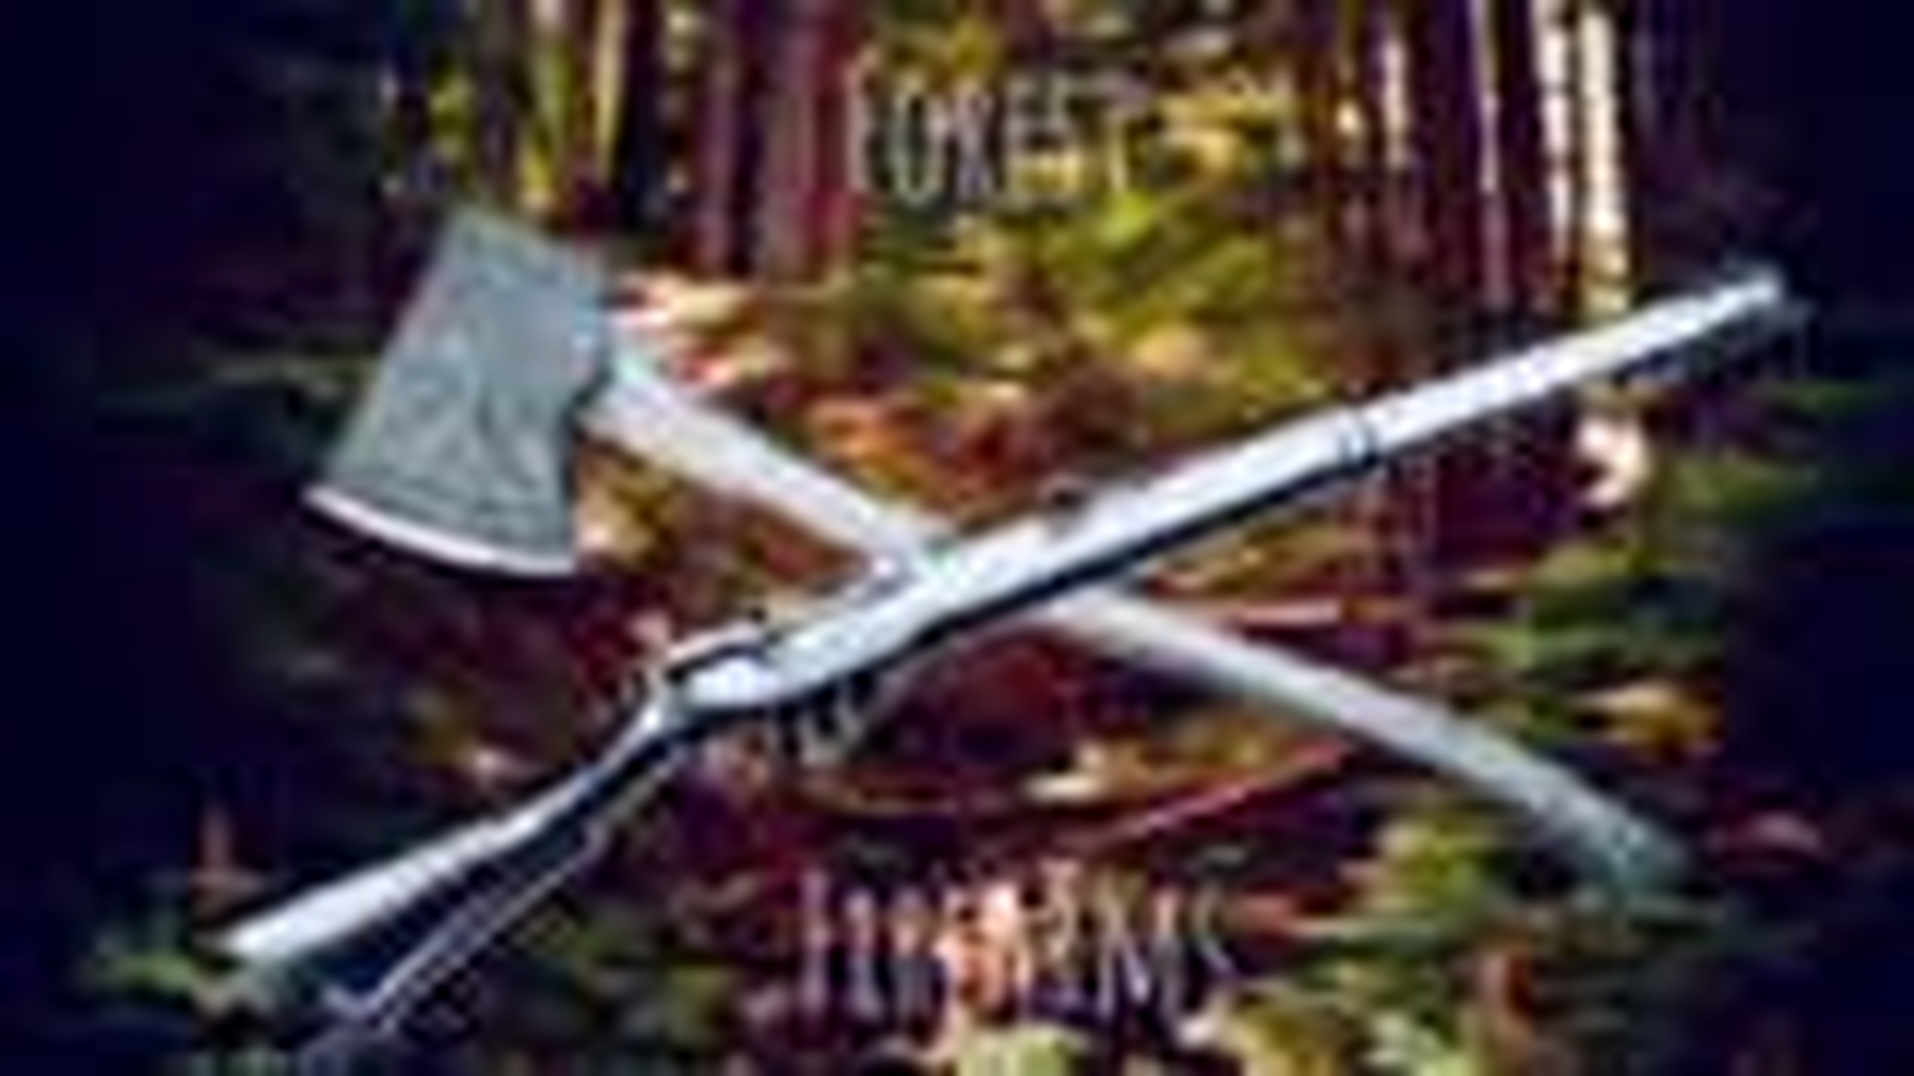 [Forest Firearms]自动军械公司M1A1汤普森卡宾型